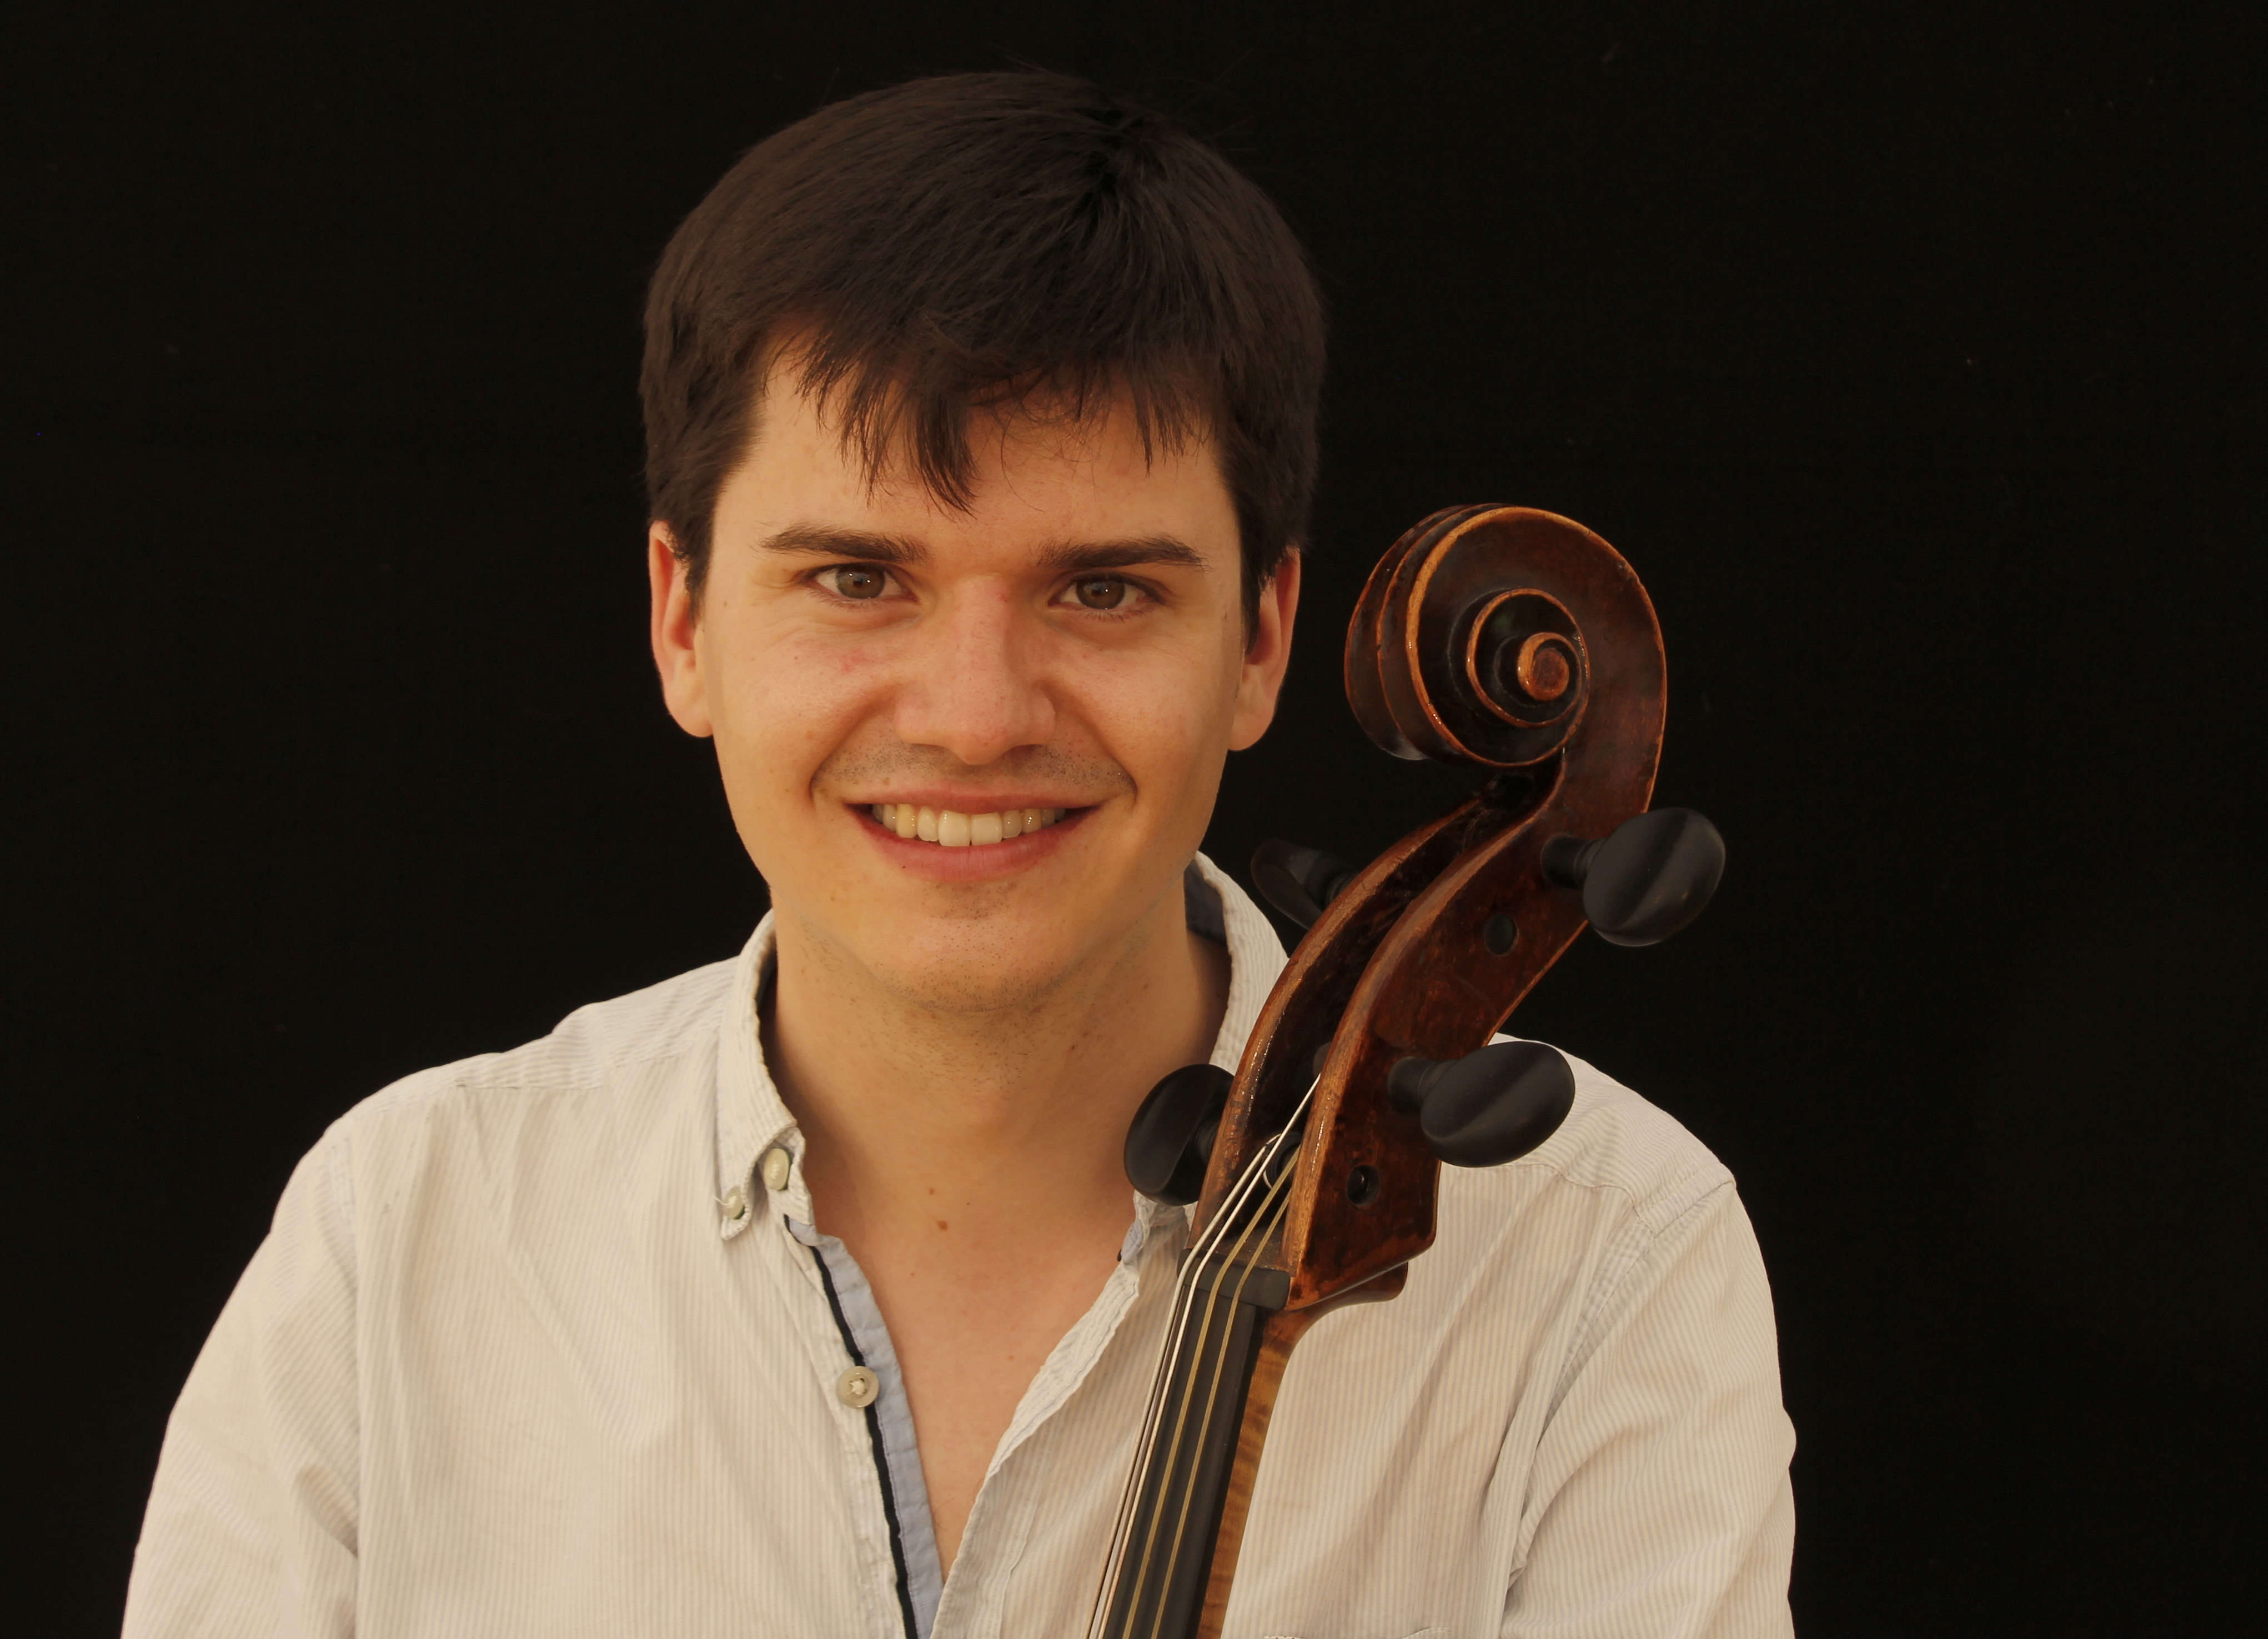 Jakob Valentin Herzog